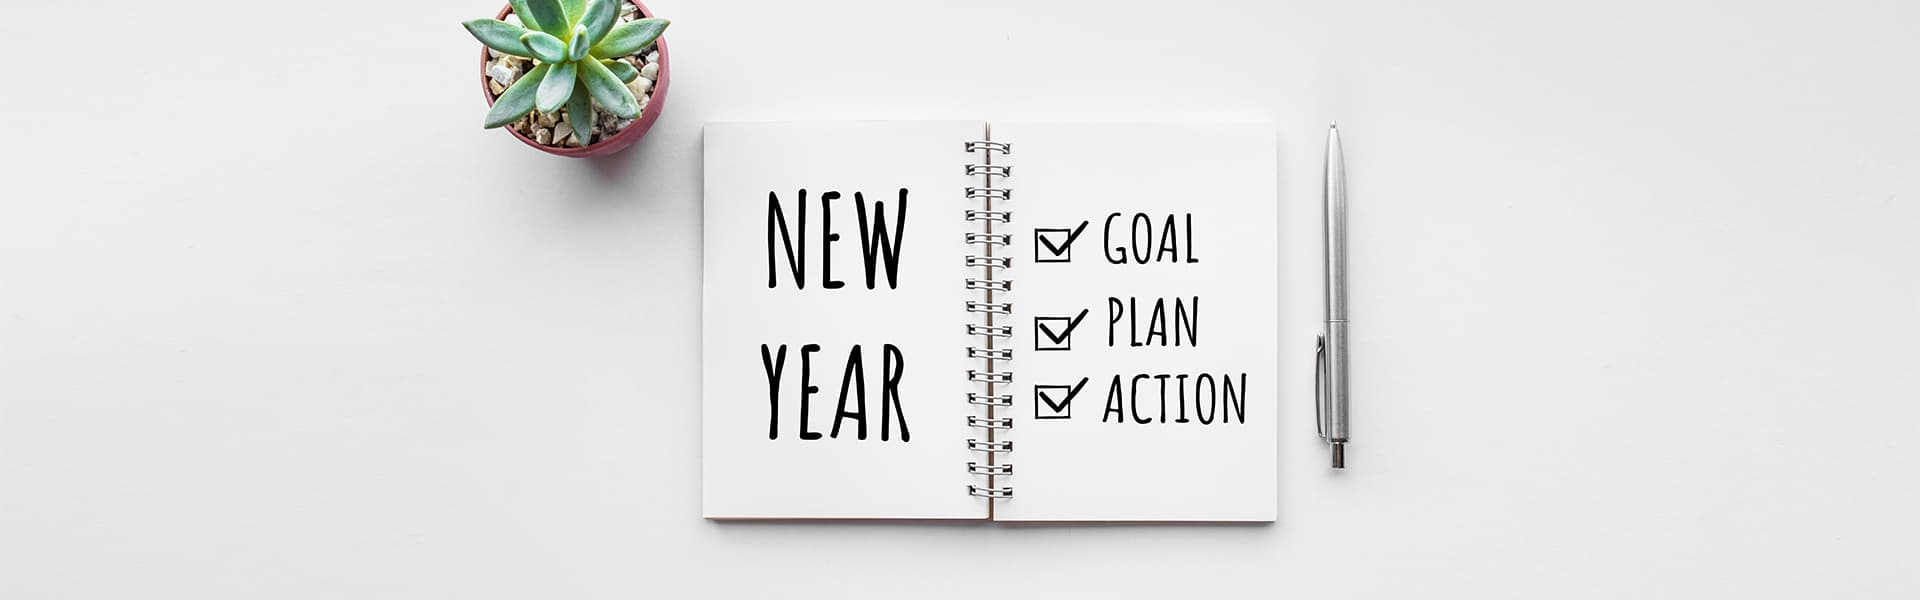 Born Intelligence, Planning, Business Planning, Goals, Strategy, Strategise,Plan, Business Plan, Action Plan